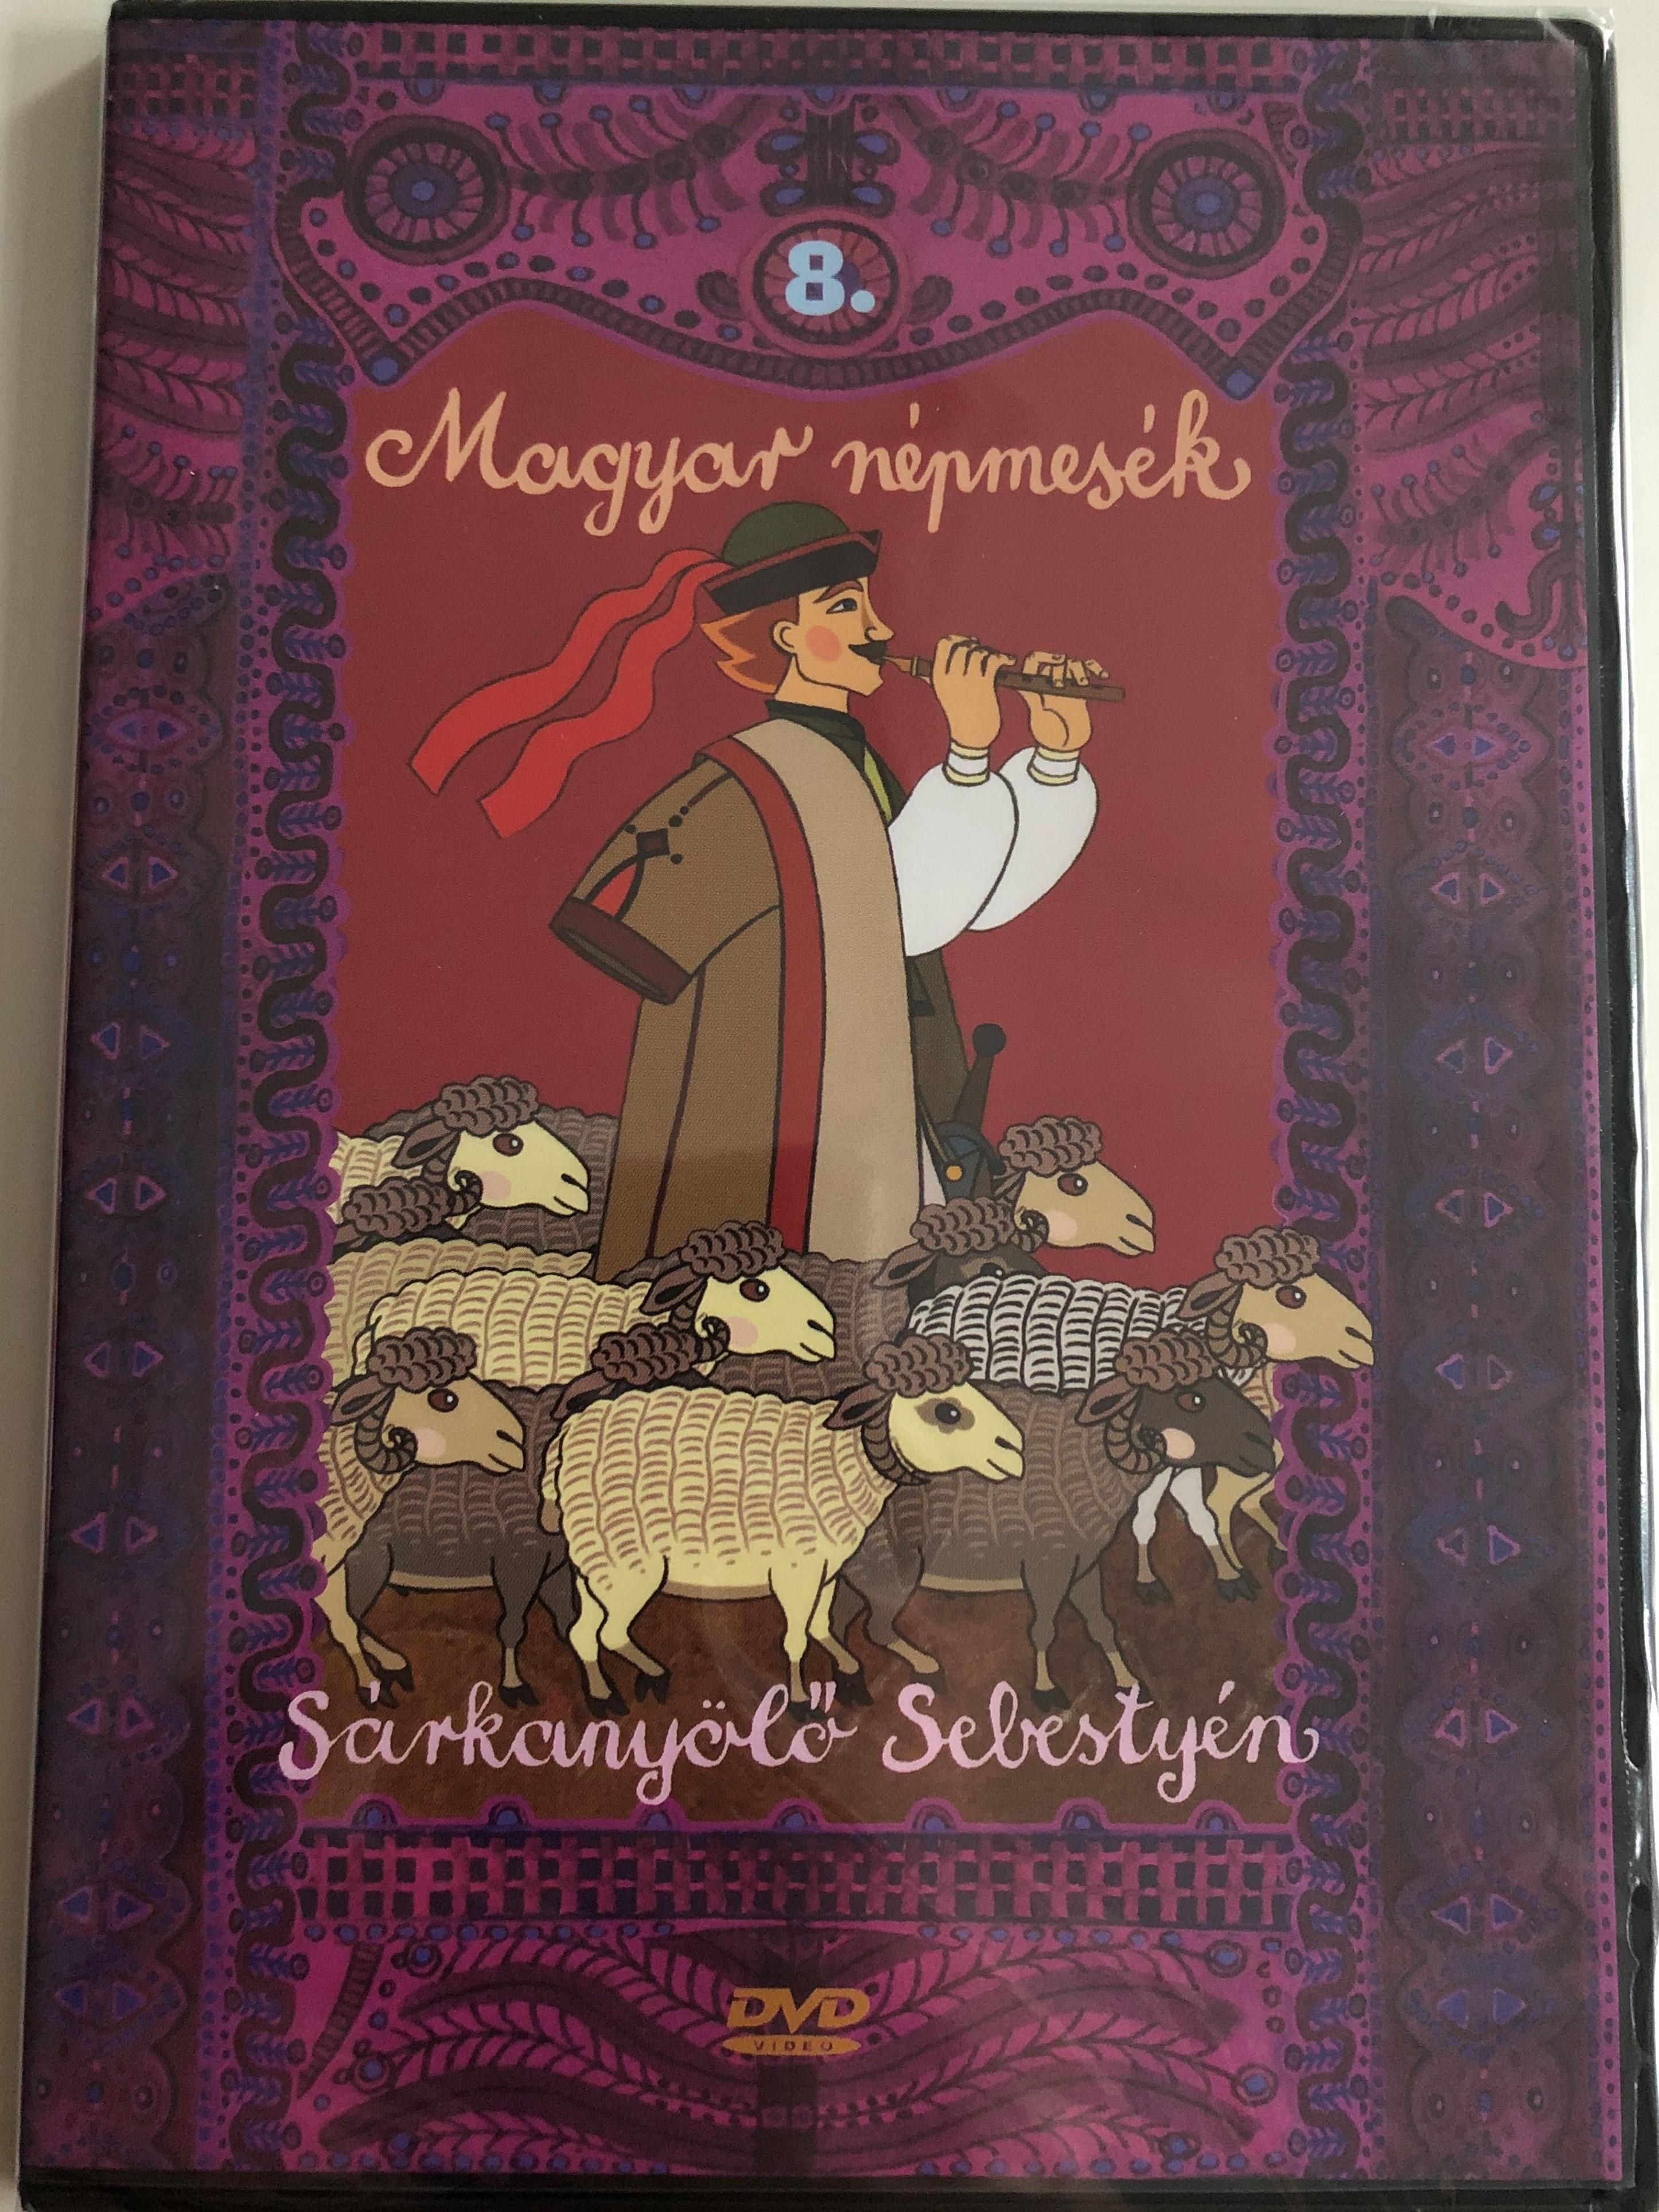 -magyar-n-pmes-k-8.-s-rk-ny-l-sebesty-n-dvd-2009-2011-hungarian-folk-tales-for-children-1-.jpg